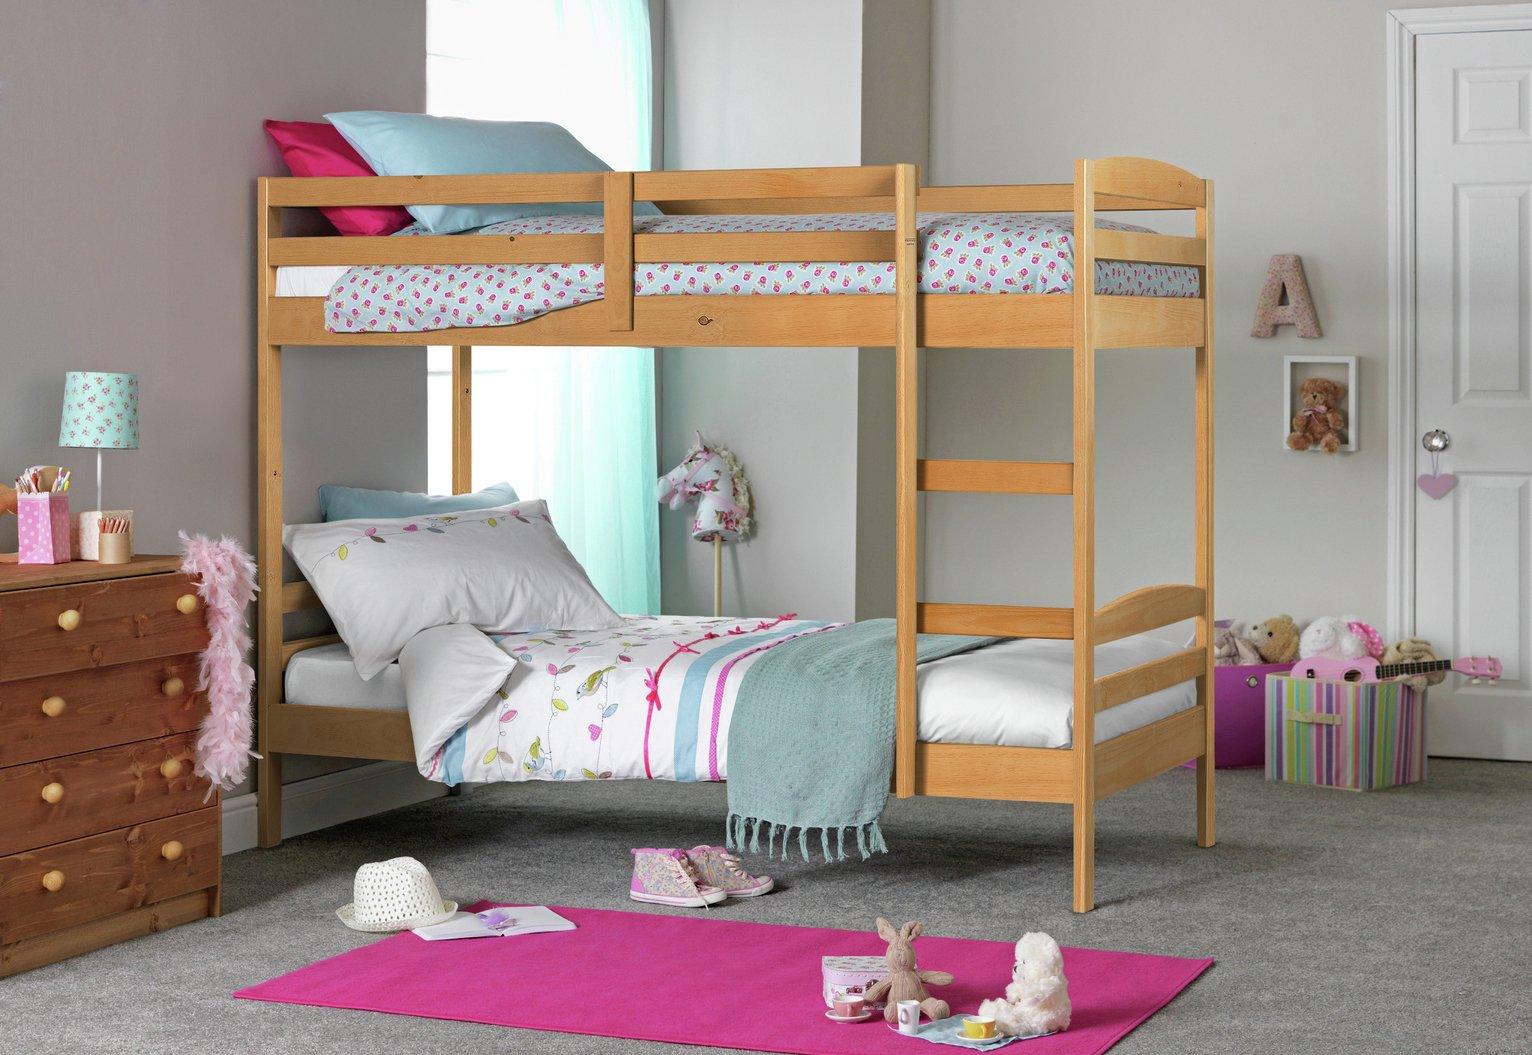 Buy Argos Home Josie Shorty Bunk Bed Frame Natural Kids Beds Argos